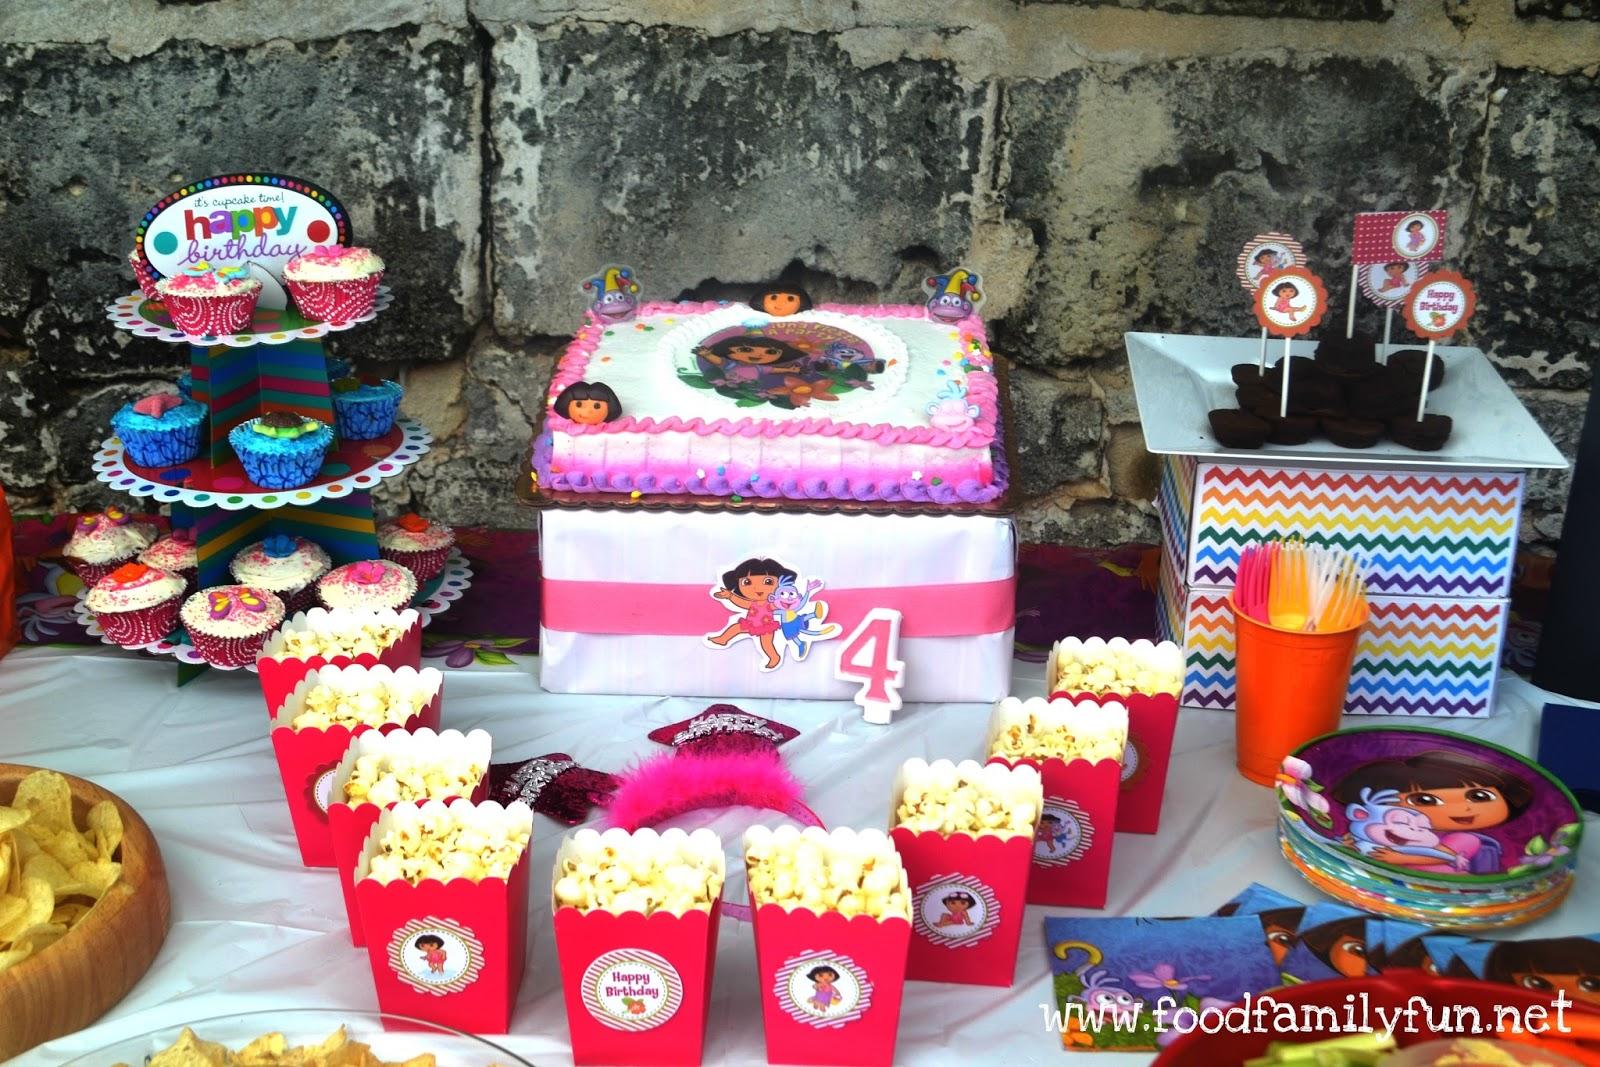 Food Family Fun Dora the Explorer Birthday Party on a budget